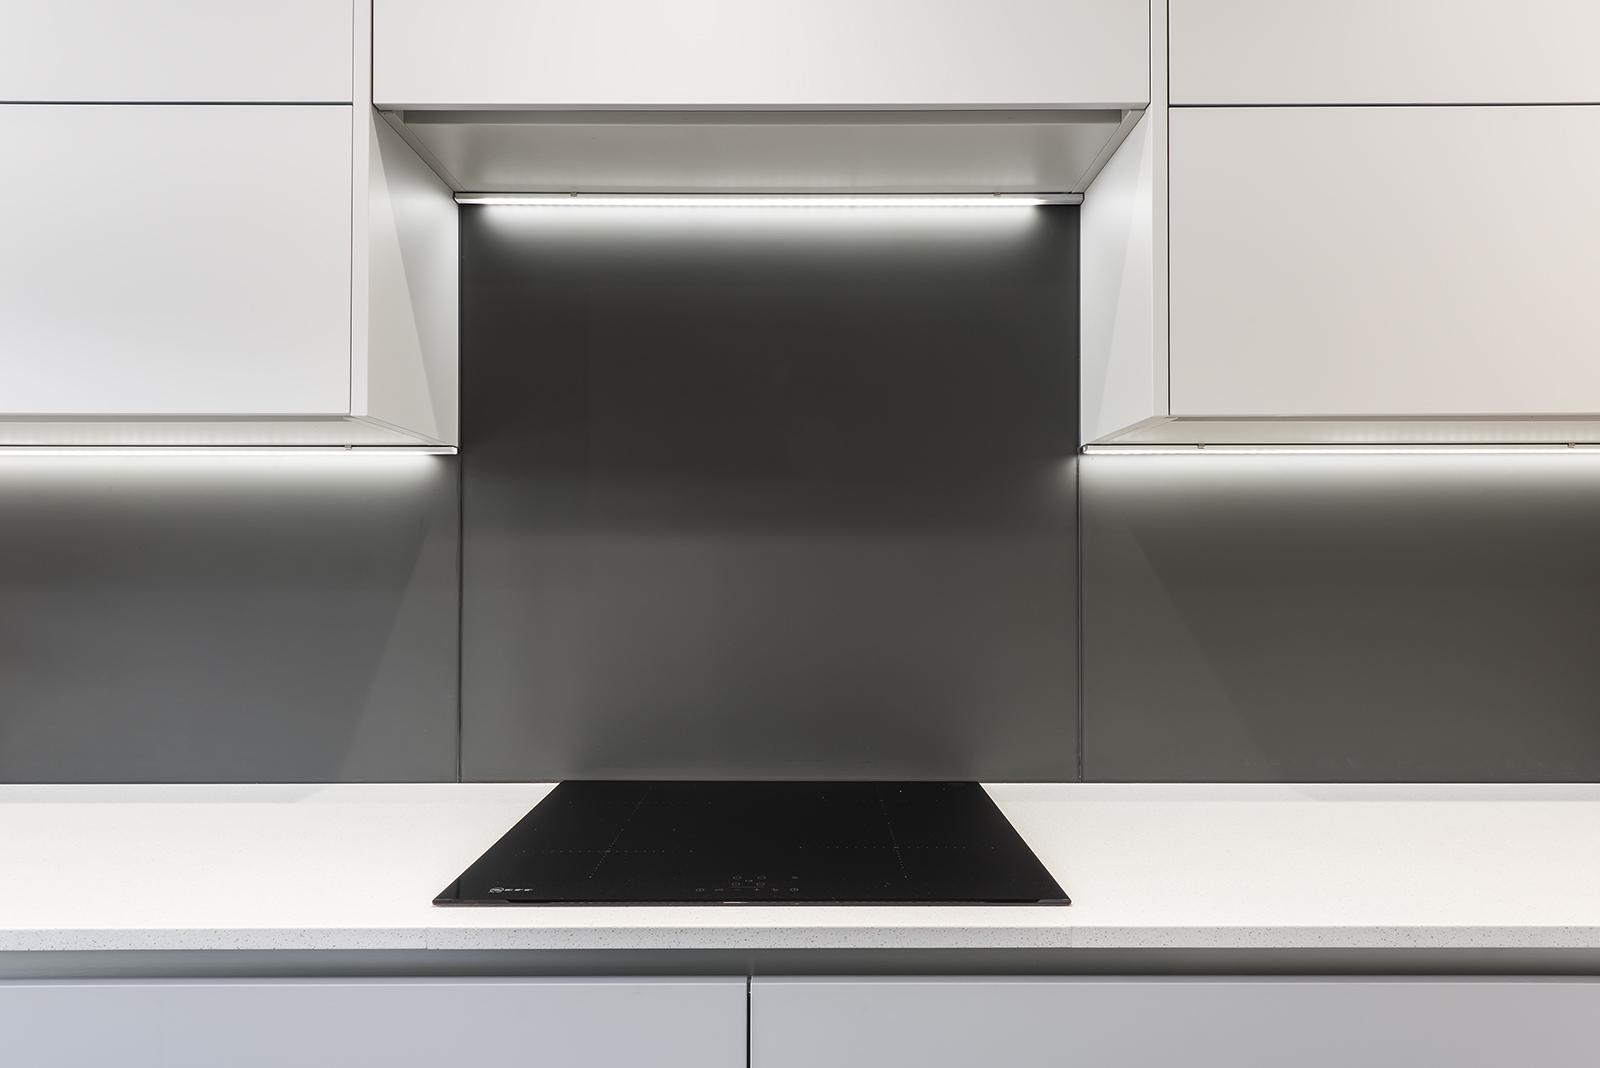 Portishead Zola Matte Light Grey Kitchen Hob